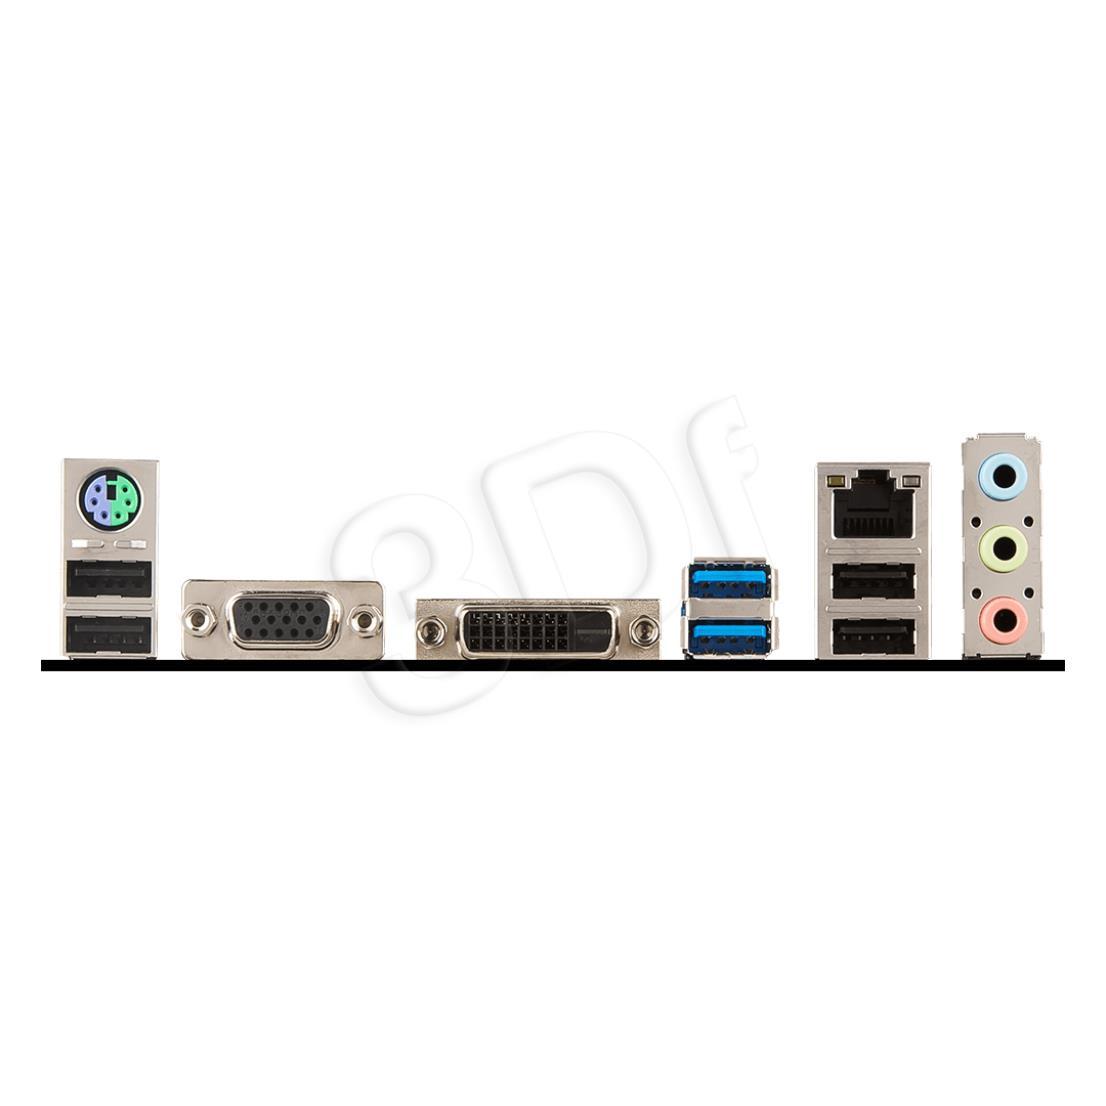 MSI H310M PRO-VD s1151 H310 2DDR4 DVI/VGA/USB3 UATX pamatplate, mātesplate